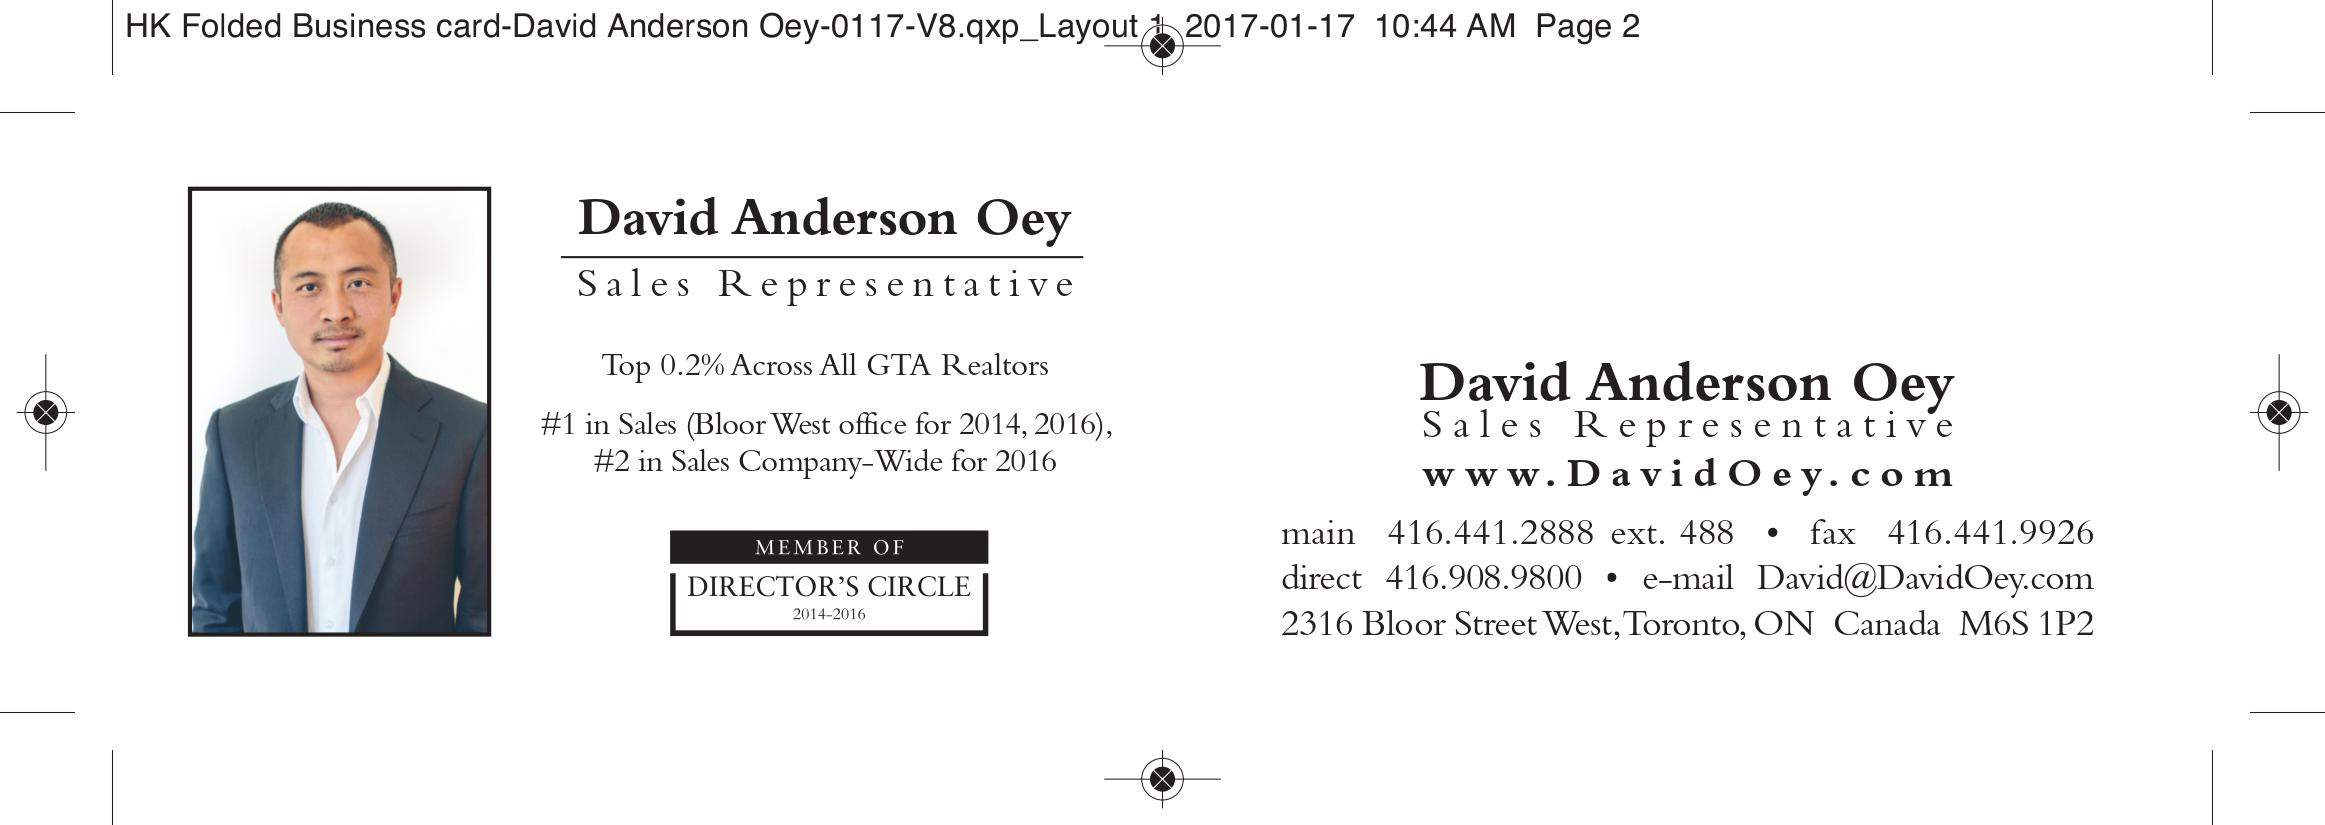 Harvey kalles business card layout jr shooter harvey kalles business card layout reheart Images